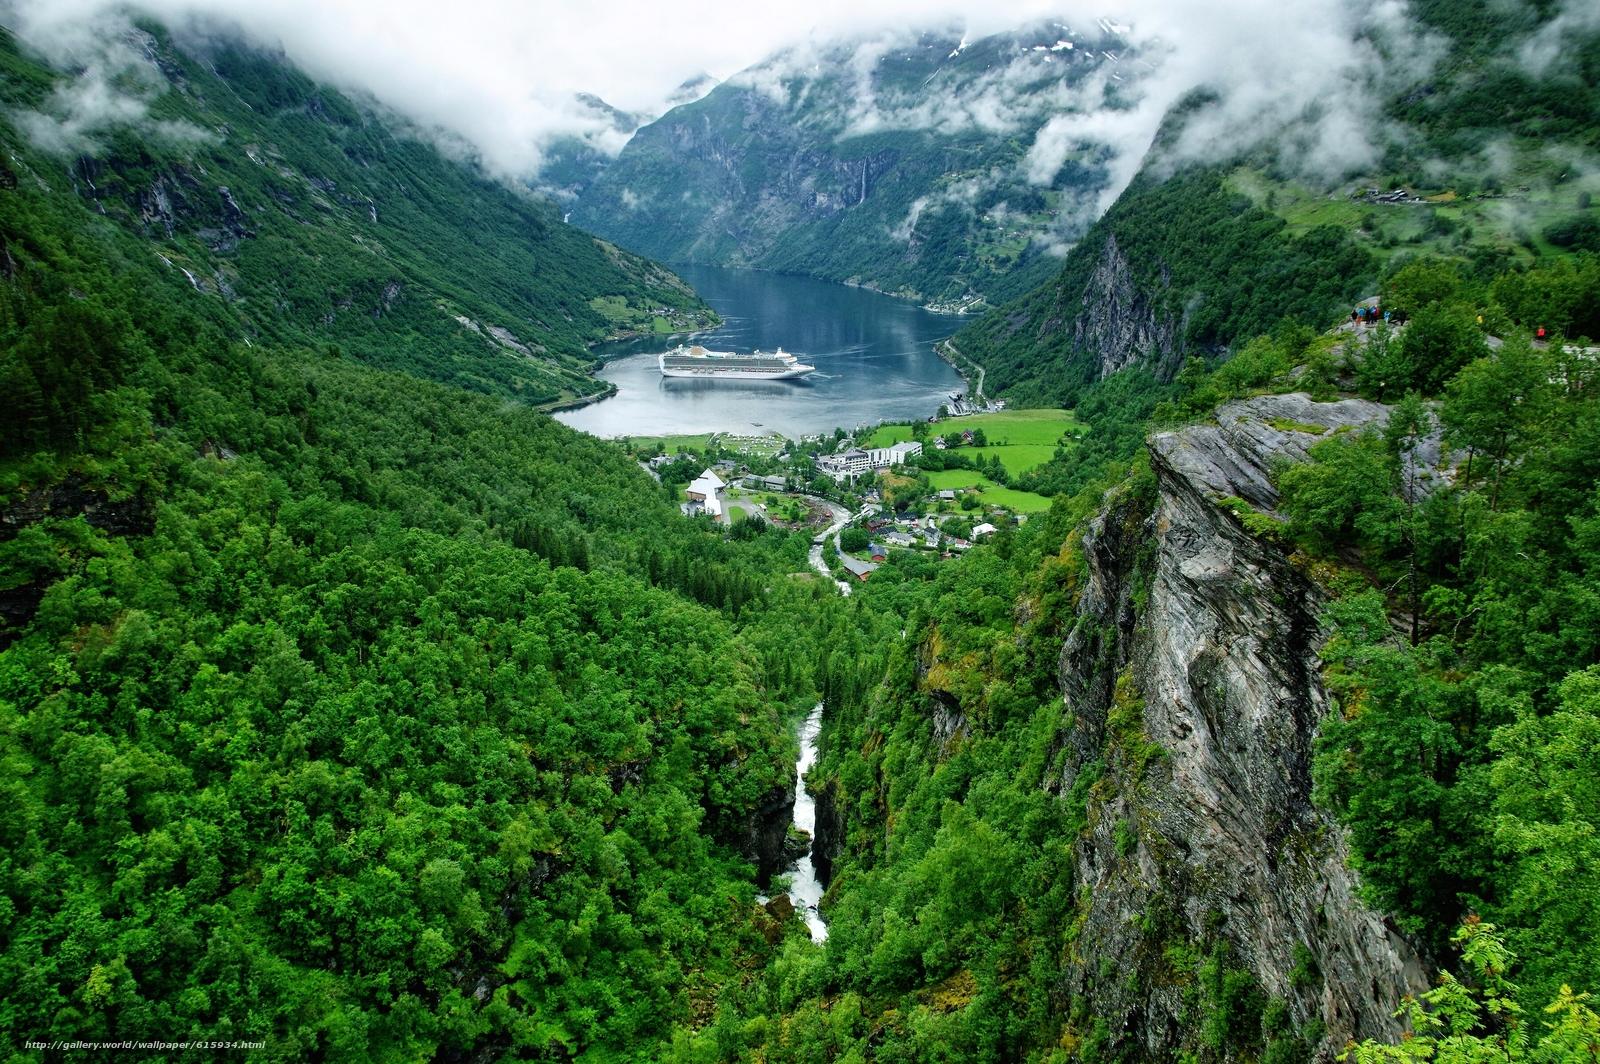 Geiranger, Geirangerfjord, Norway, Гейрангер, Гейрангер-фьорд, Норвегия, фьорд, горы, деревня, лайнер, панорама